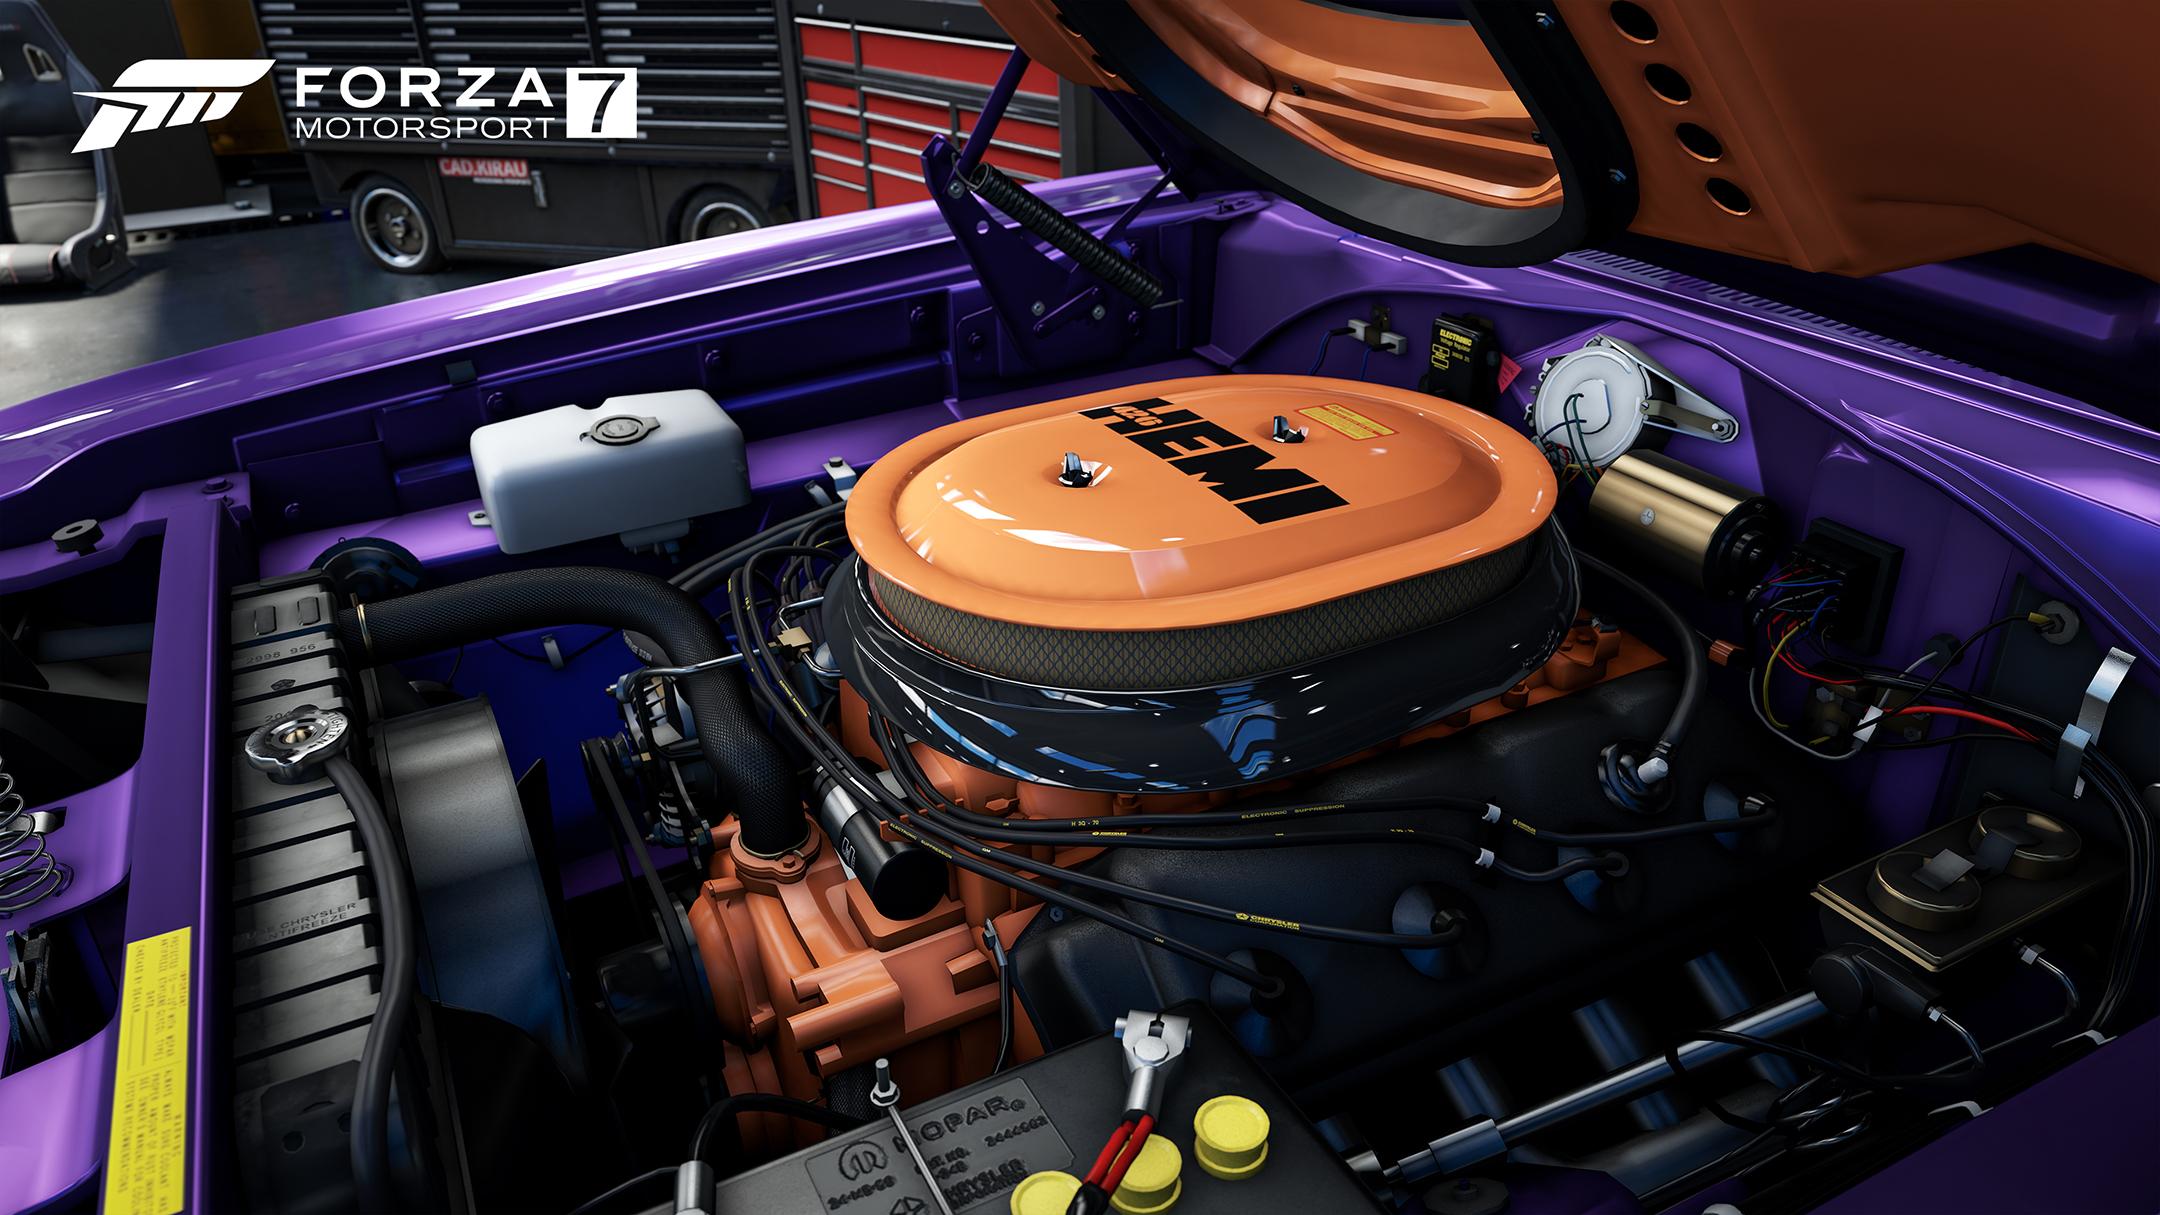 Forza Motorsport 7 - screen -  under the hood HEMI engine